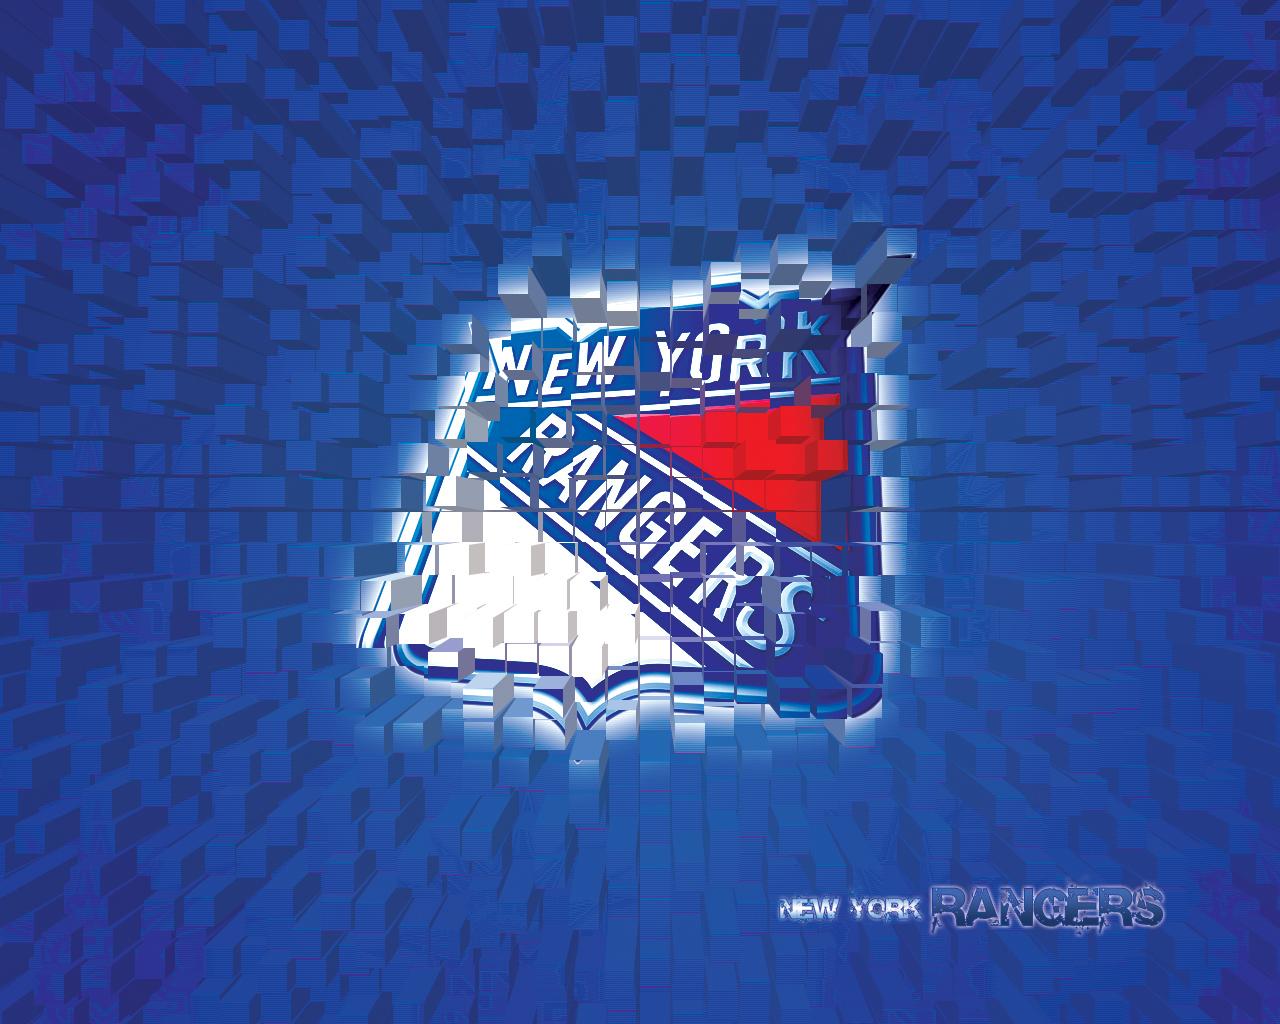 New York Rangers Iphone Wallpaper: New York Rangers Wallpapers